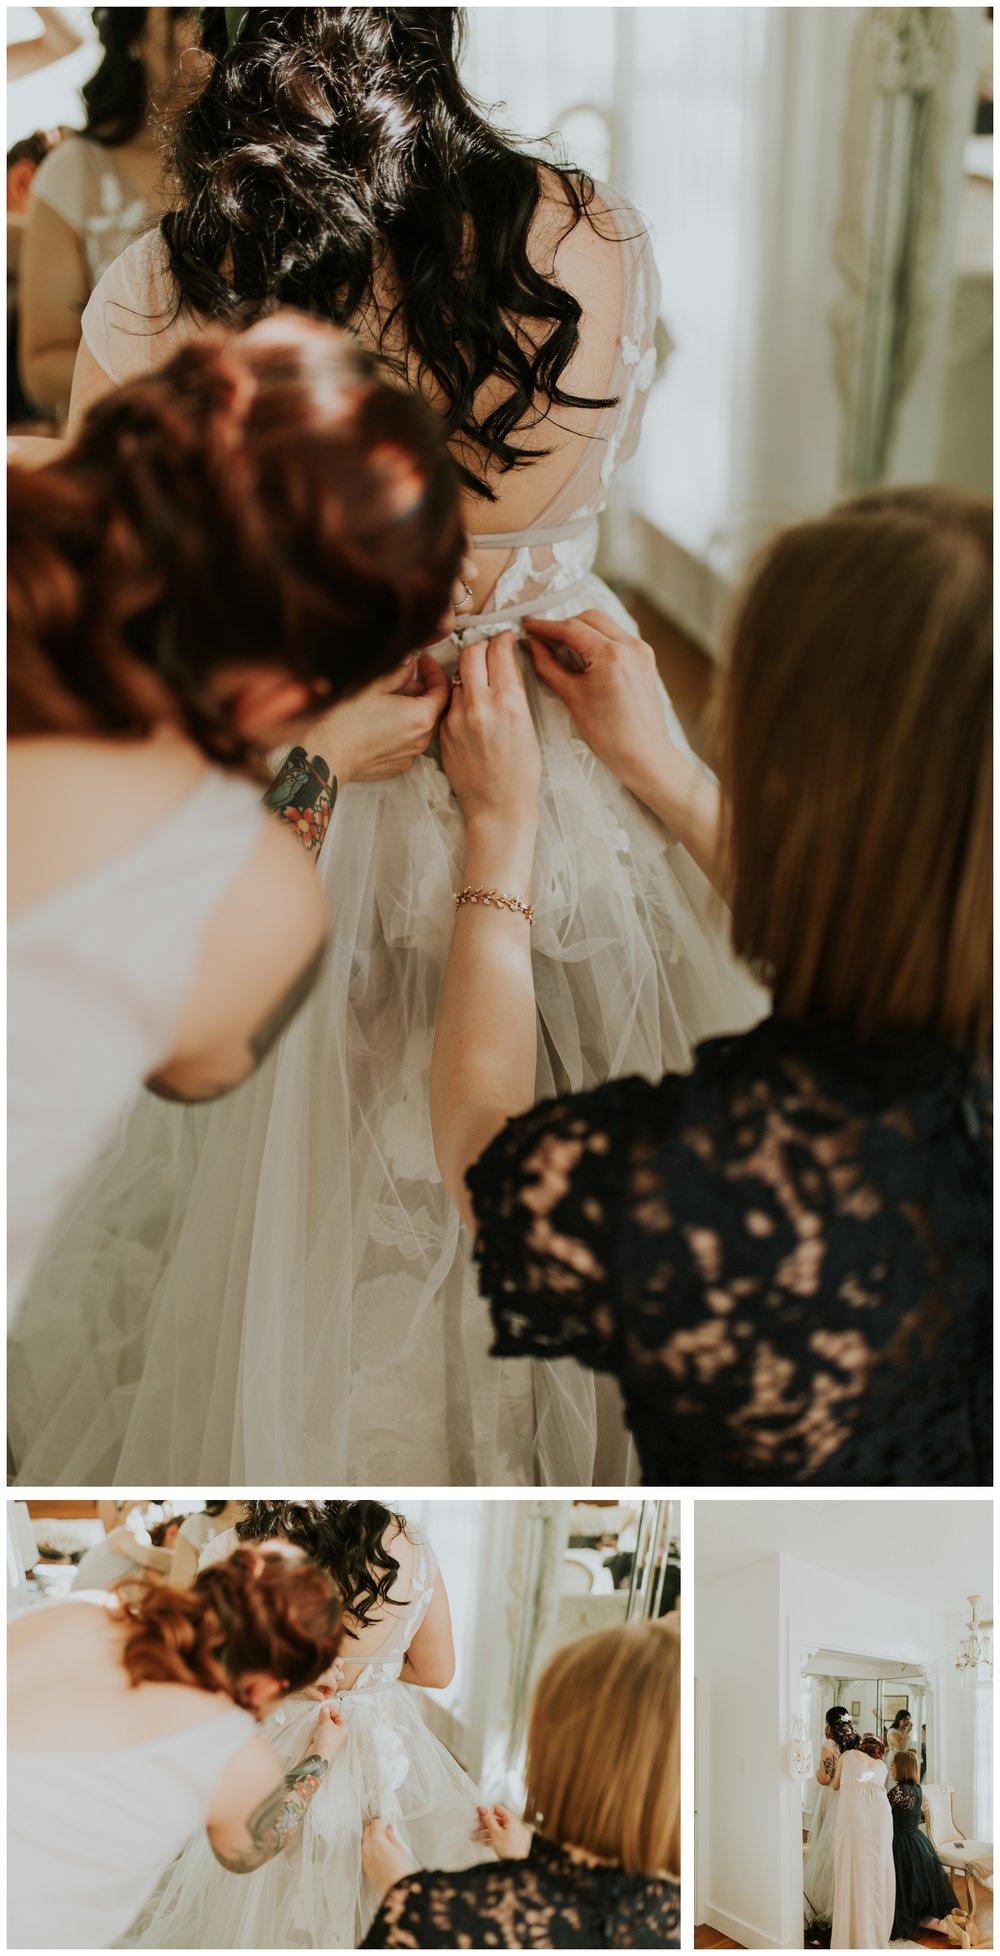 Sarah+Michael, Gruene Estate Wedding, San Antonio, Contista Productions Wedding Photography_0050.jpg